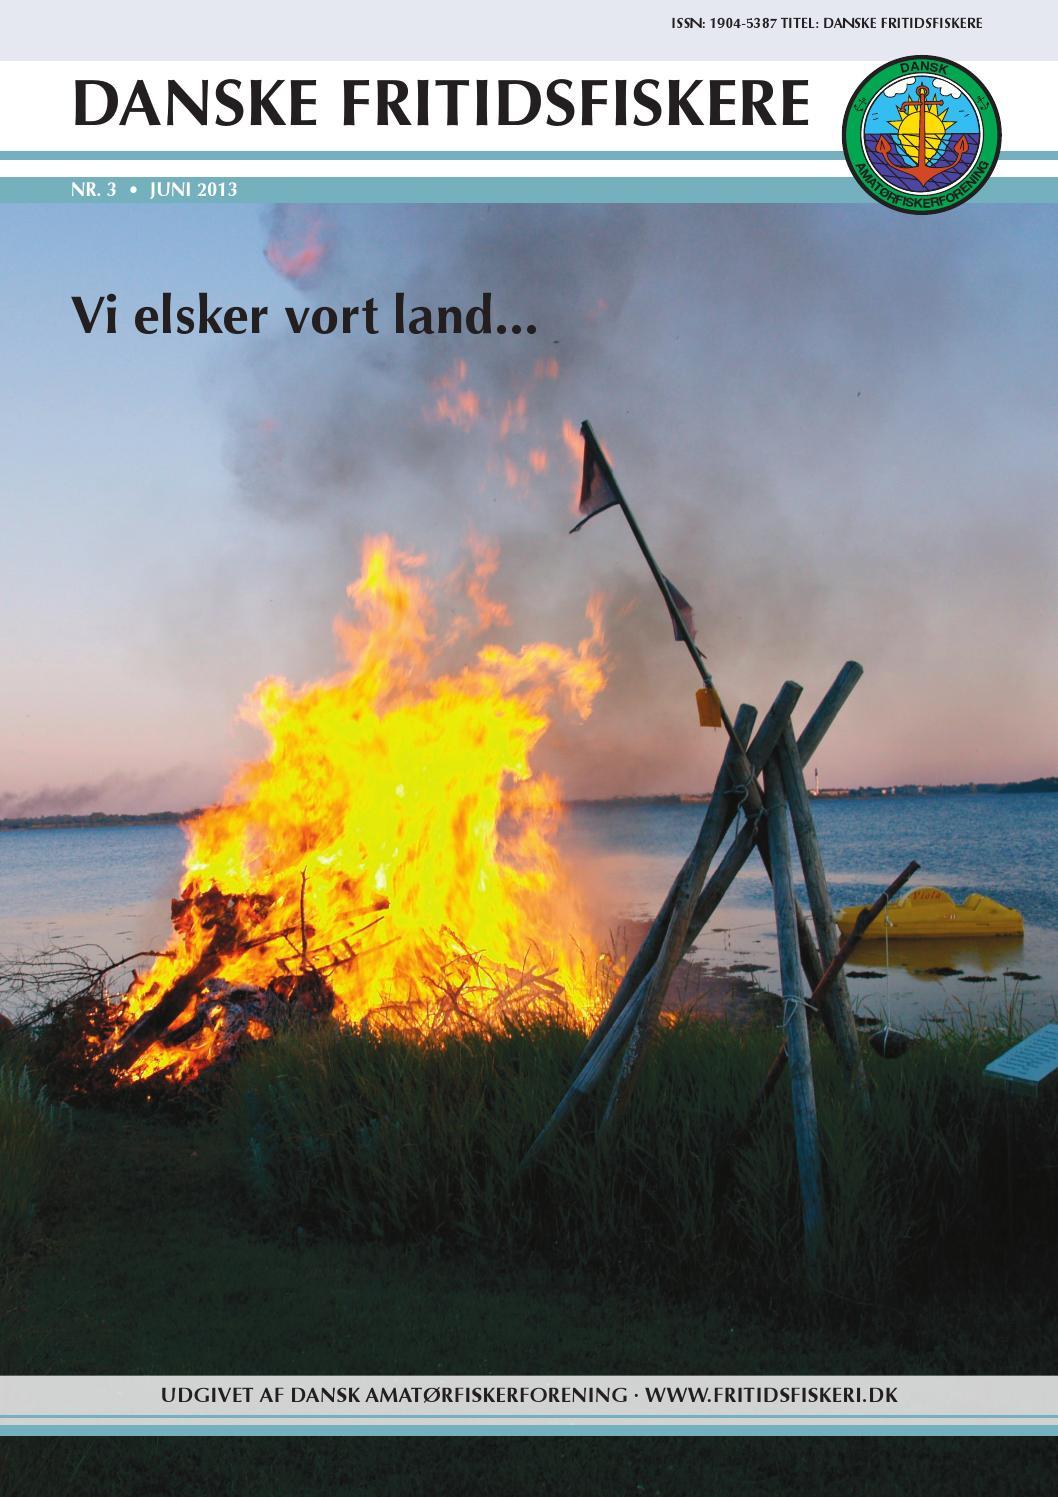 yen wellness gamle danske pornofilm